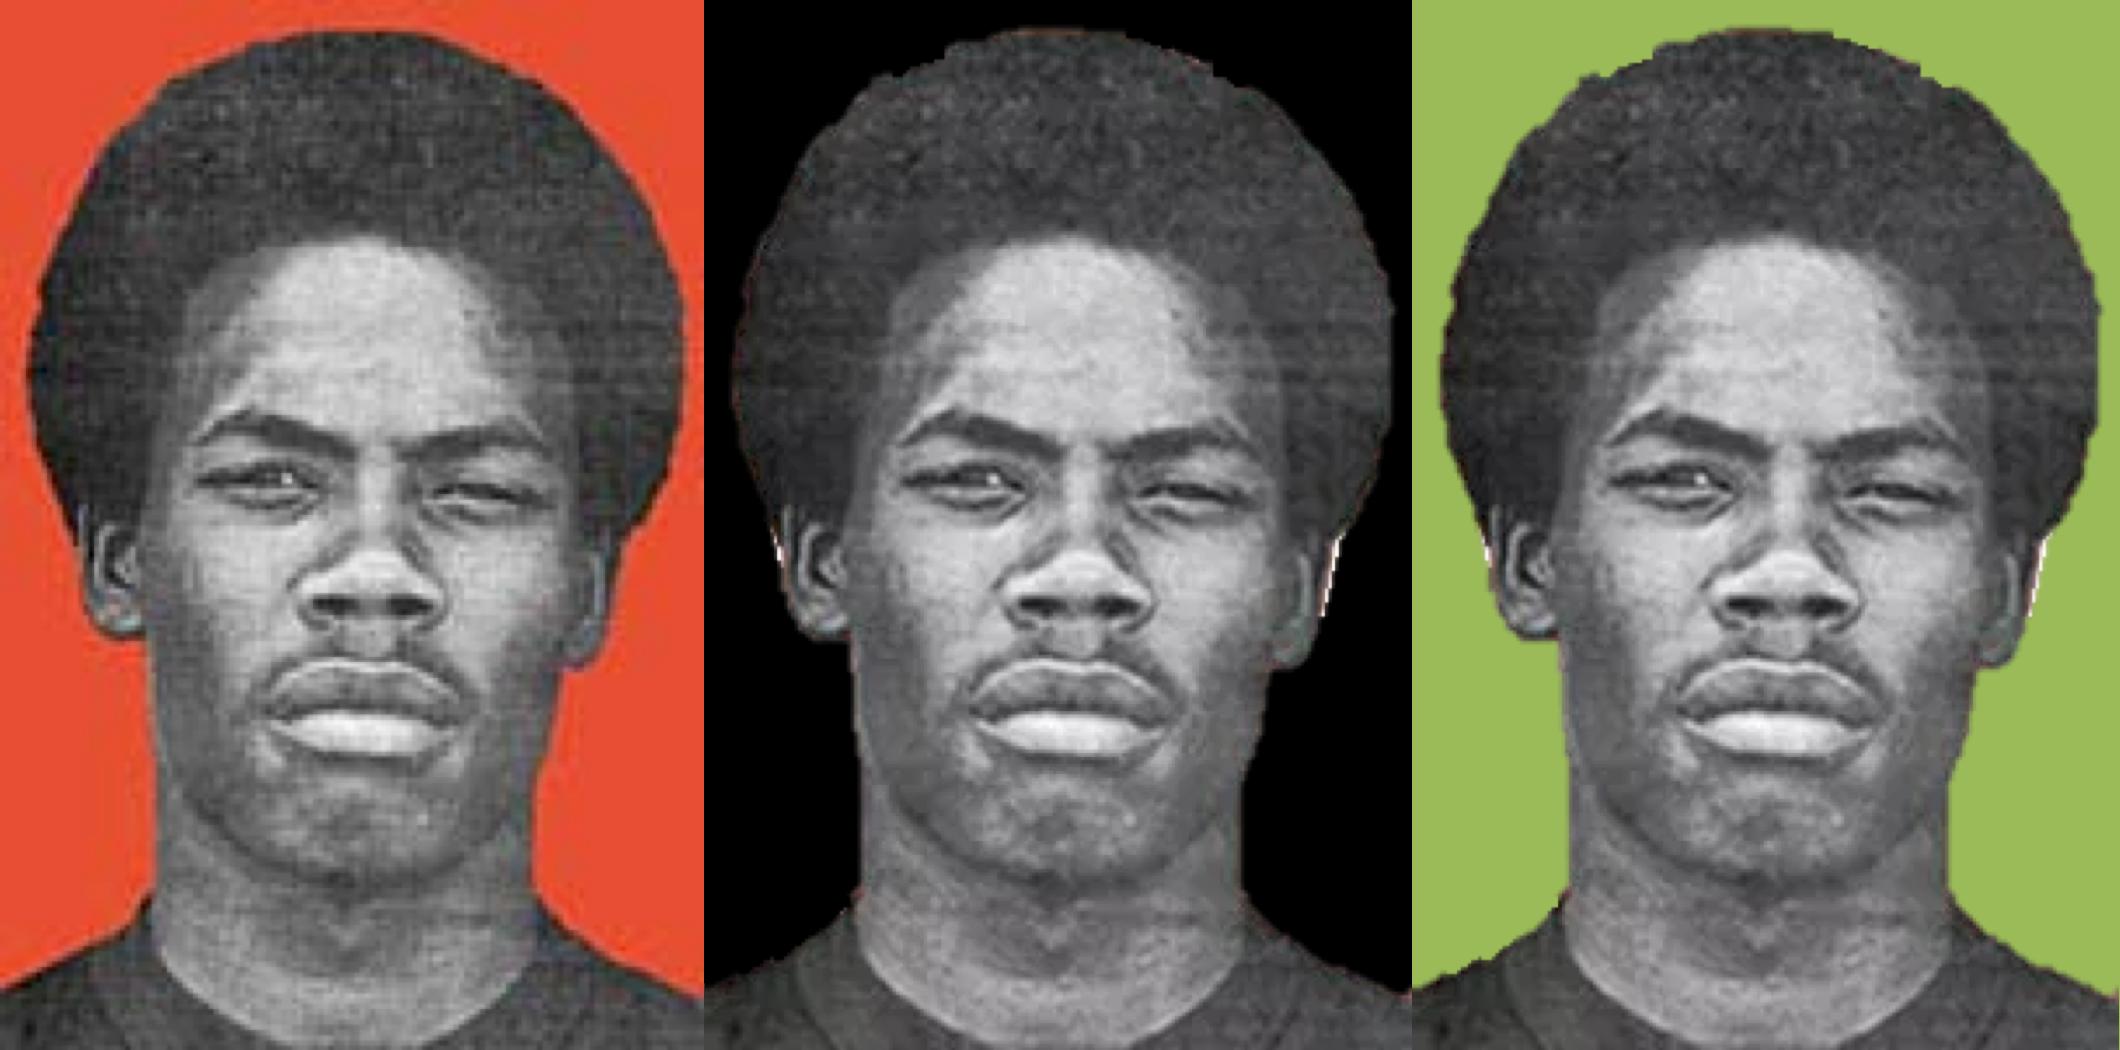 "Black Panthers, The Black Panther Party, Mumia Abu-Jamal, Jamil Abdullah Al-Amin, H. Rap Brown, Sundiata Acoli, Herman Bell, Veronza Bowers, Romaine ""Chip"" Fitzgerald, Kenny ""Zulu"" Whitmore, Eusi Zulu Heshima, Ruchell ""Cinque"" Magee, Jalil Abdul Muntaqim, Anthony Bottom, Pete O'Neal, Ed Poindexter, Assata Shakur, Mutulu Shakur, Russell 'Maroon' Shoatz, Russell Shoats, Kamau Sidiki, Freddie Hilton, Seth Ben Ysaac Ben Ysrael, Robert 'Seth' Hayes, African American News, KOLUMN Magazine, KOLUMN, KINDR'D Magazine, KINDR'D"